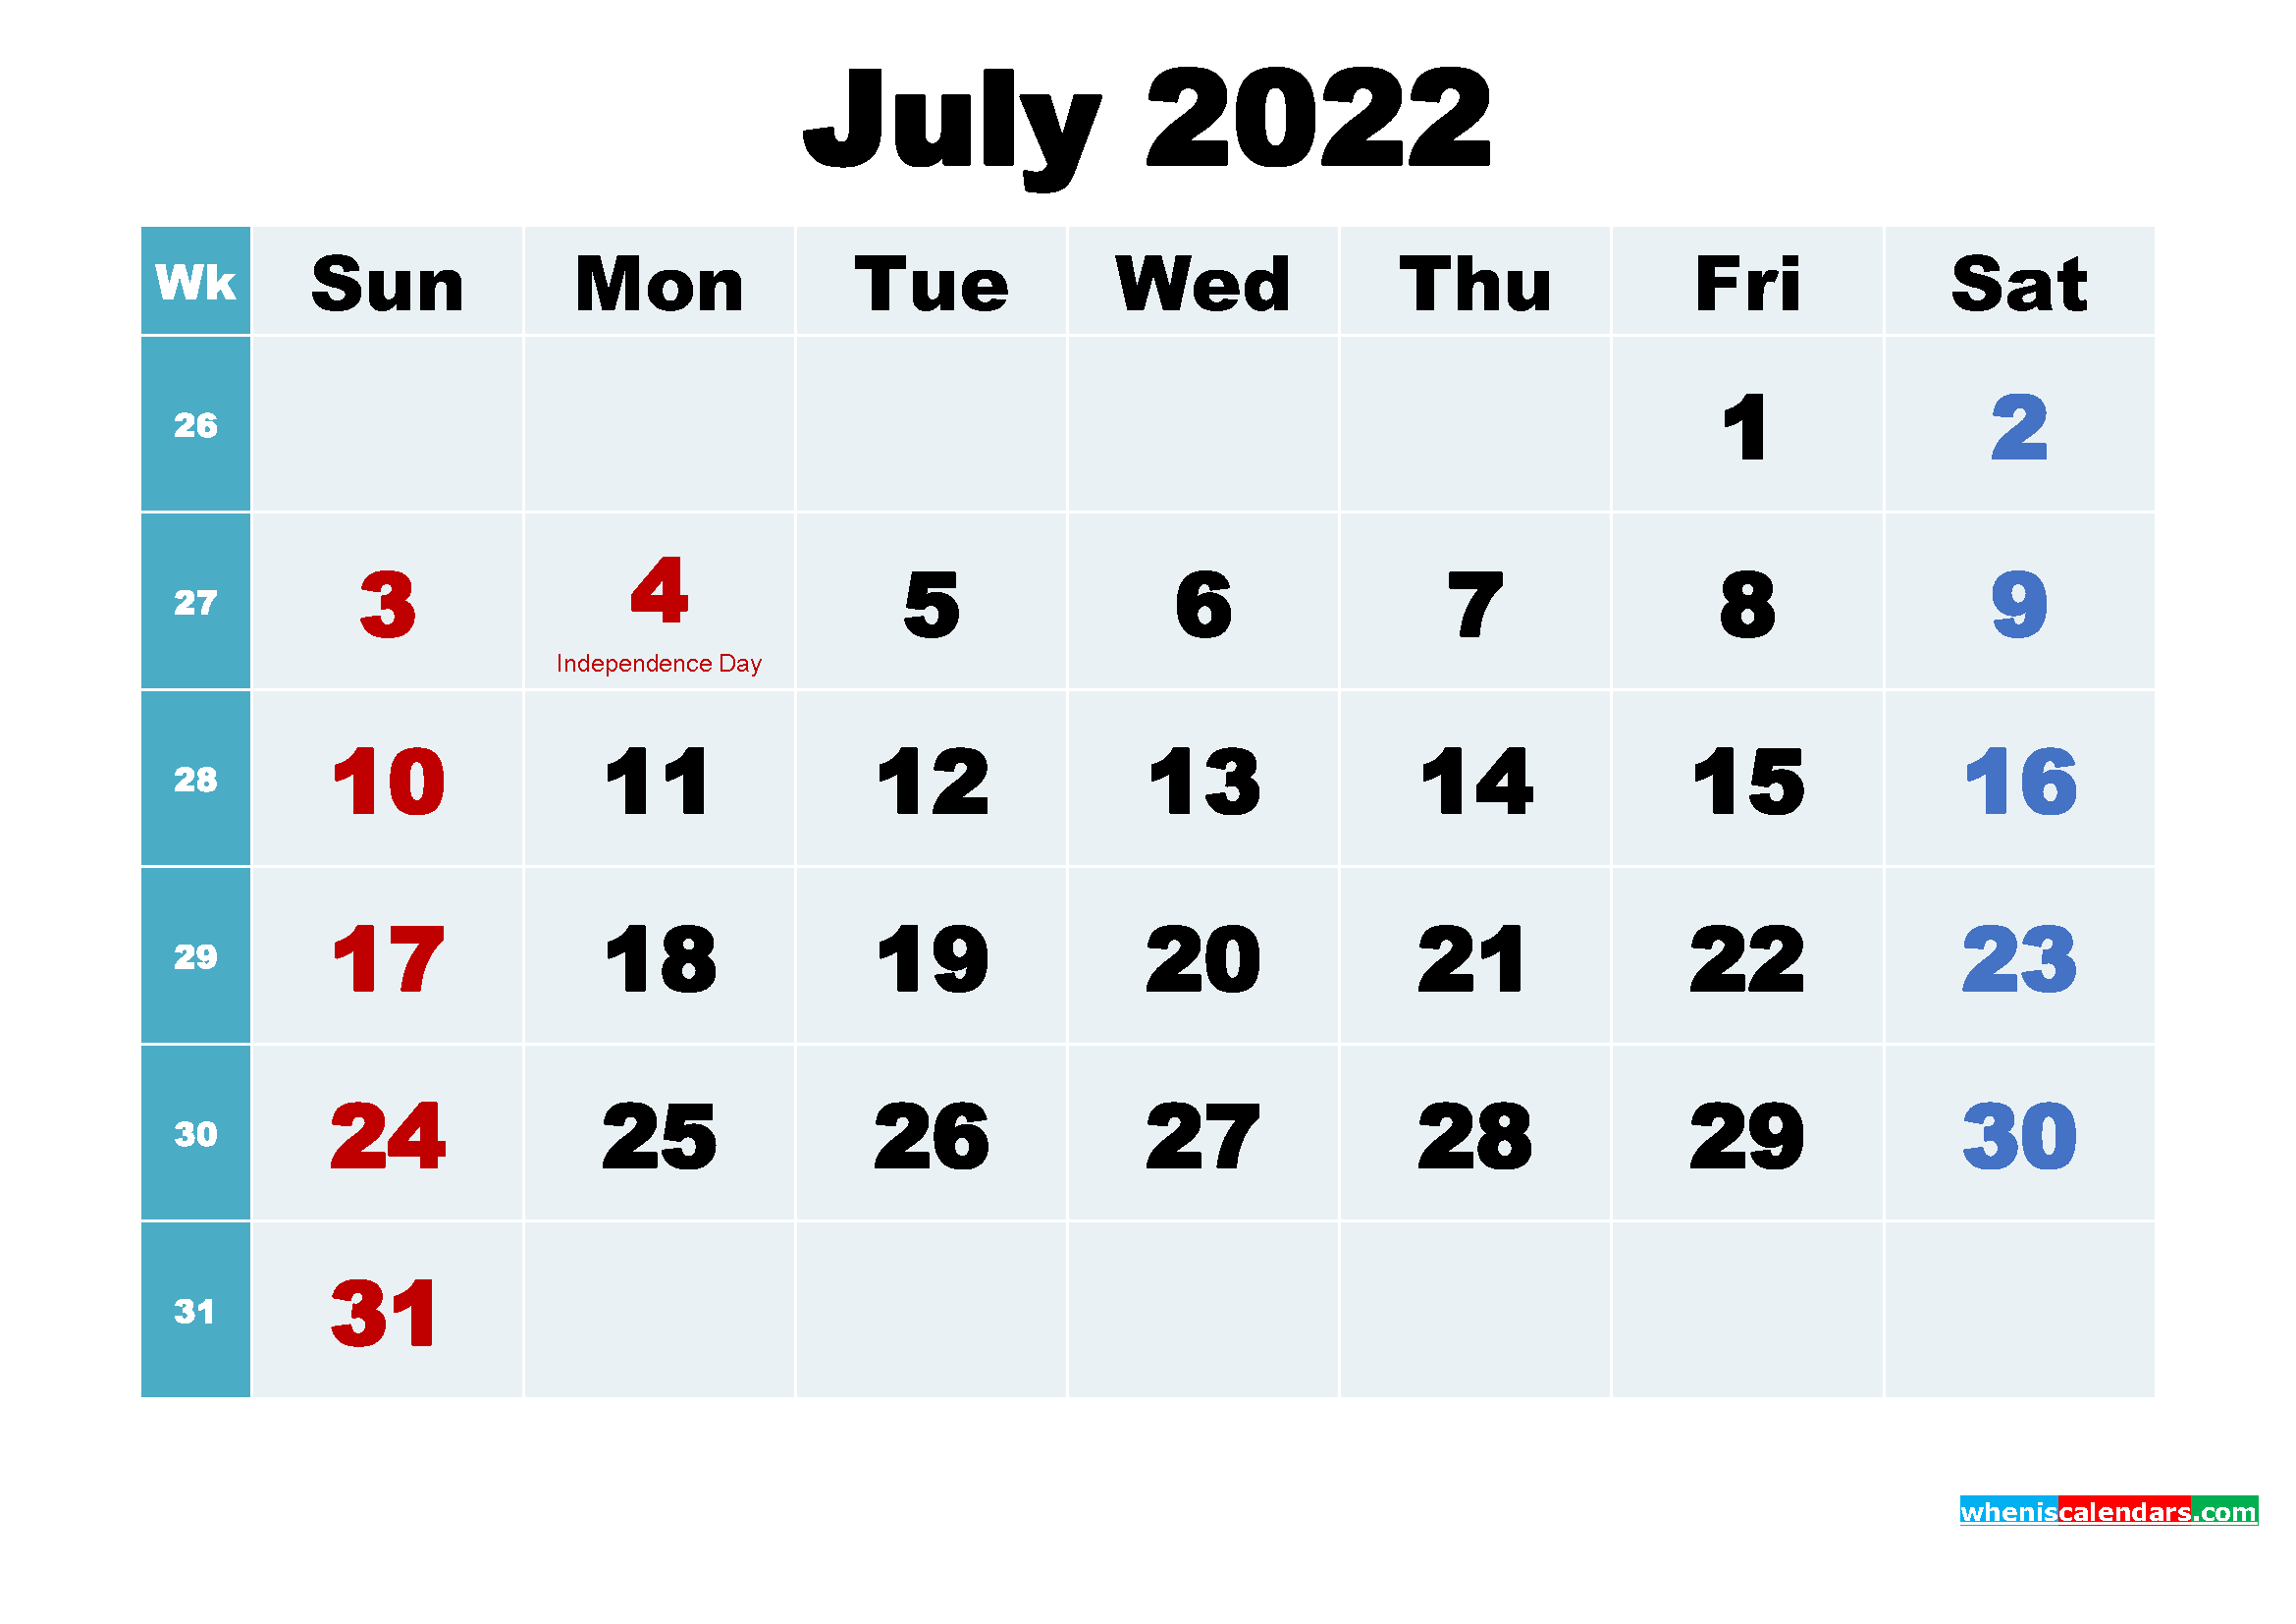 Free Printable July 2022 Calendar Wallpaper